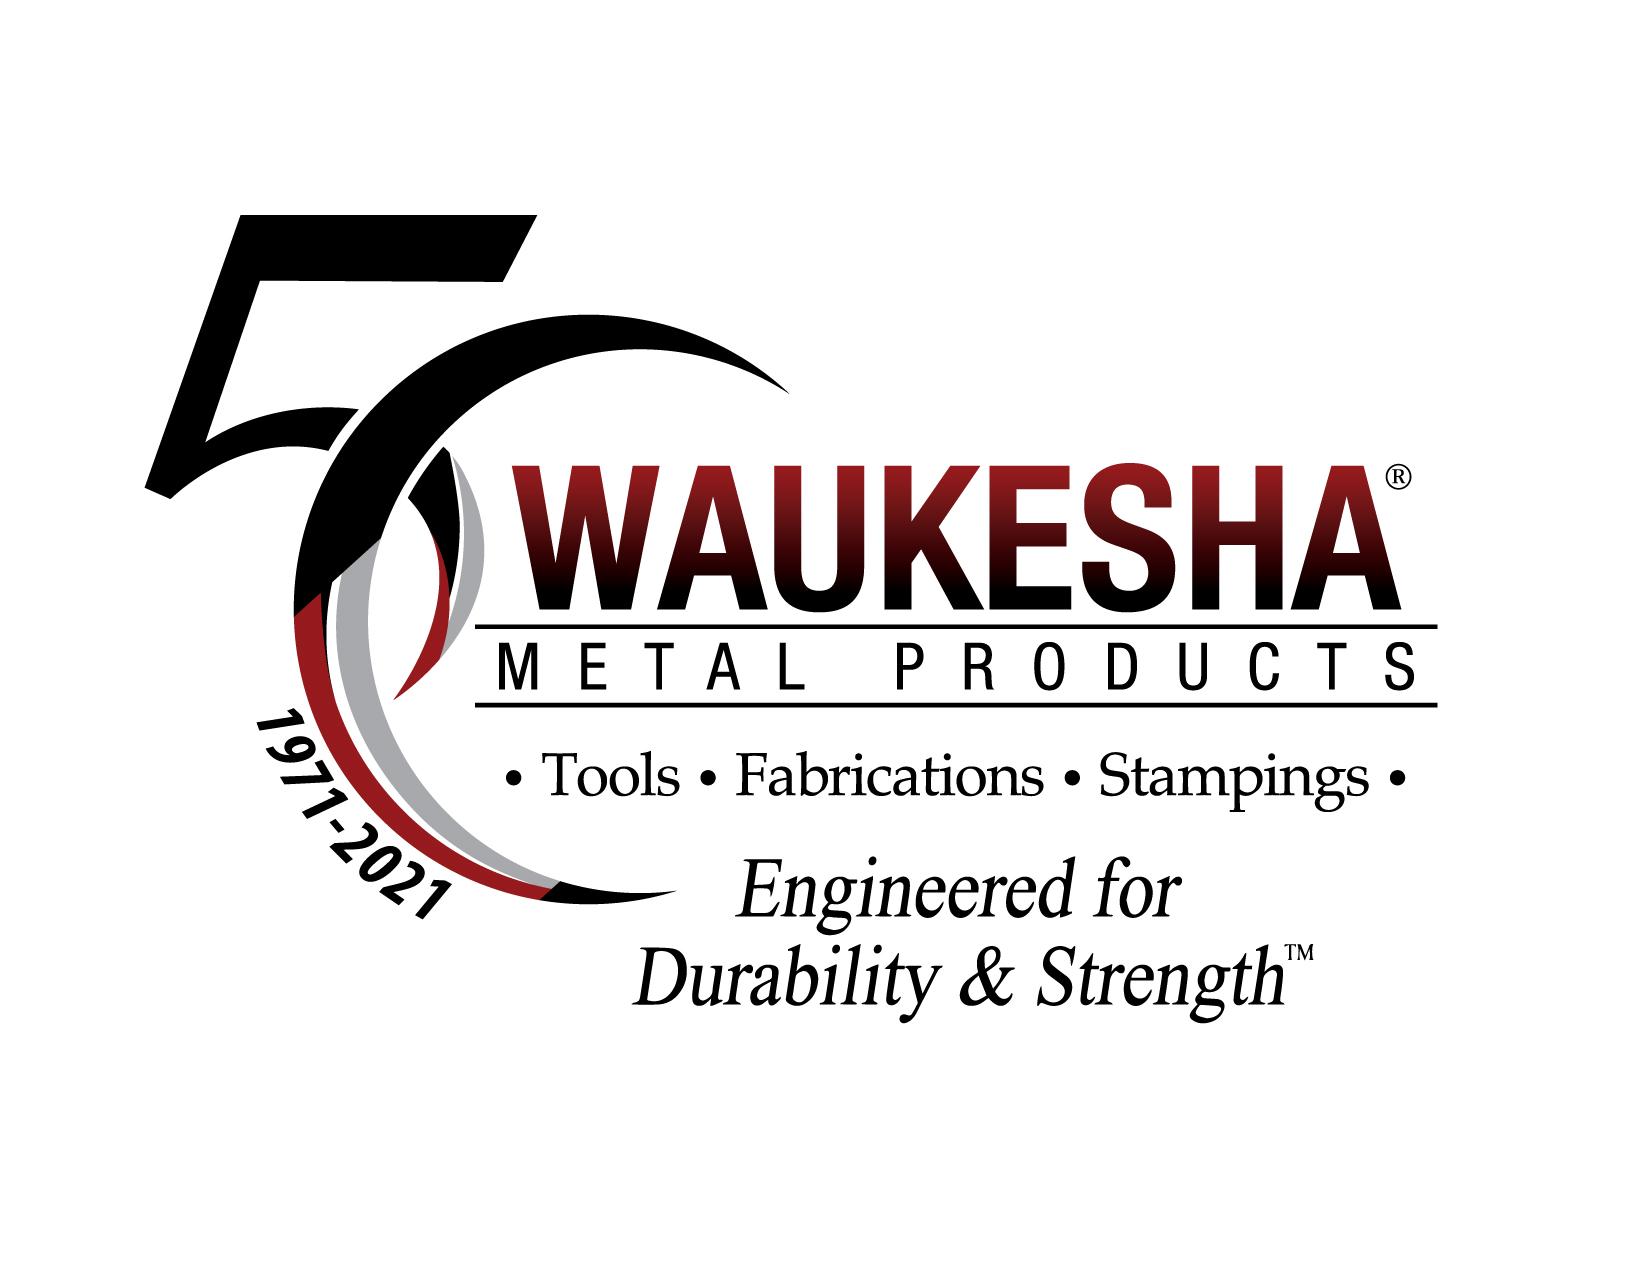 Waukesha Metal Products 50th Anniversary Logo